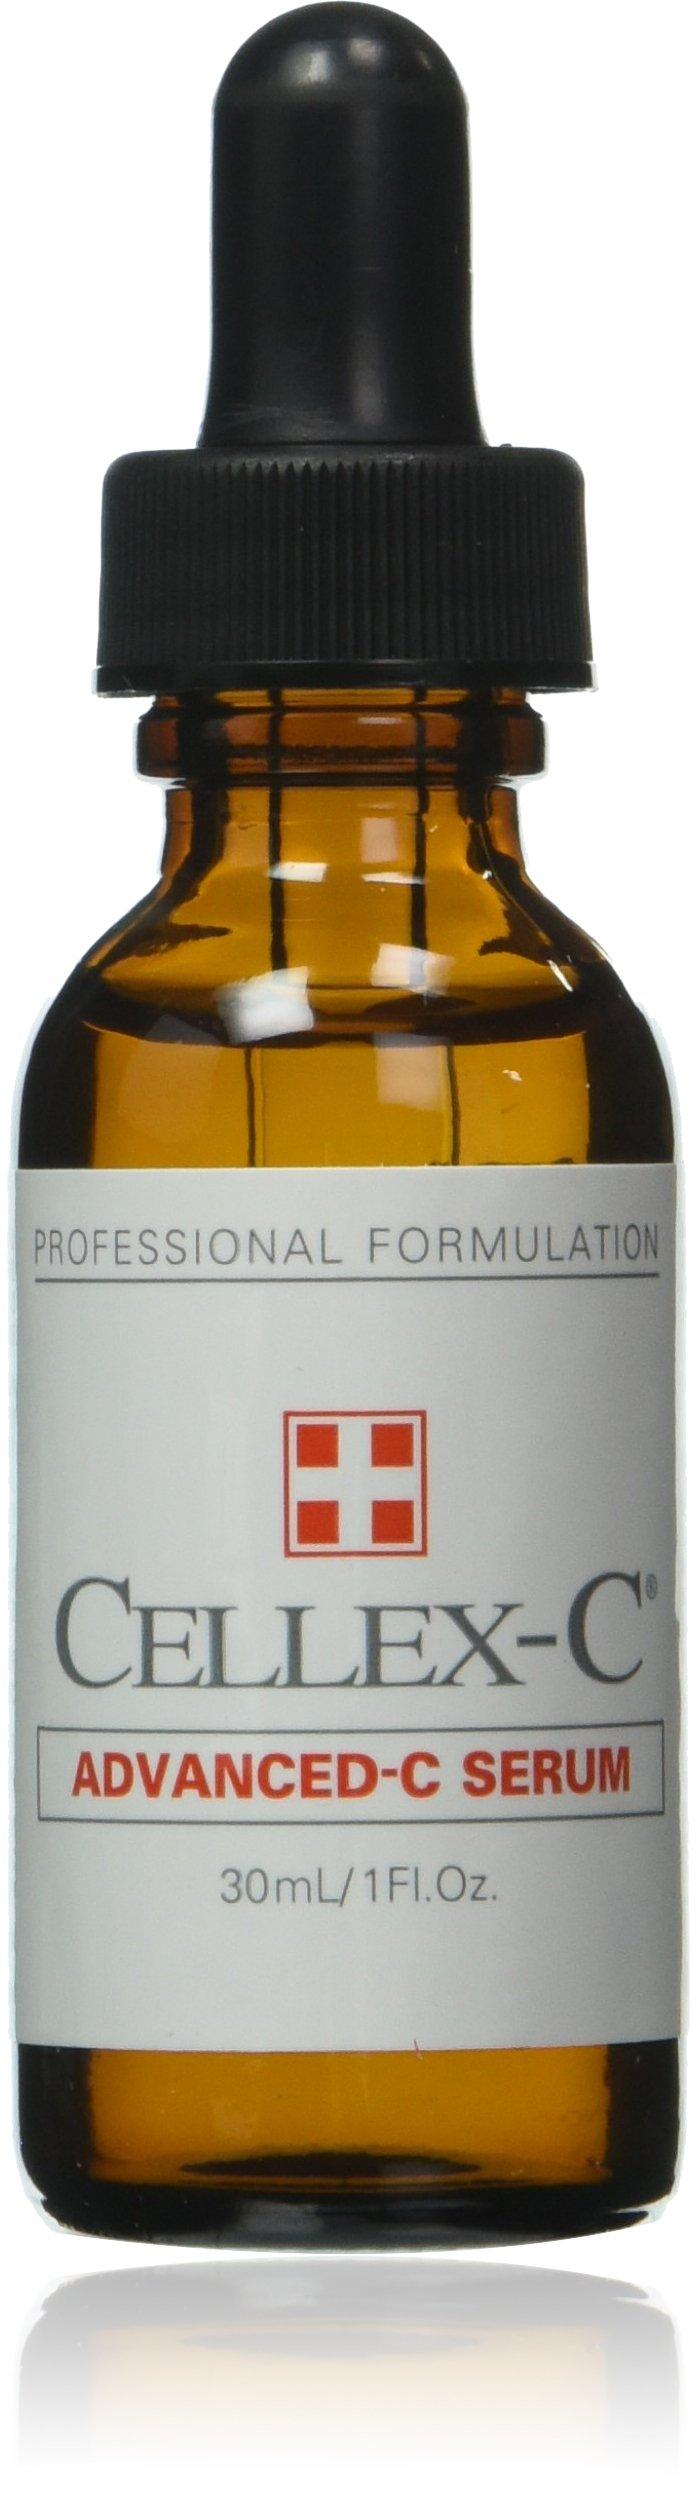 Cellex-C Advanced-C Serum, Professional Formulation, 30 ml/1 oz